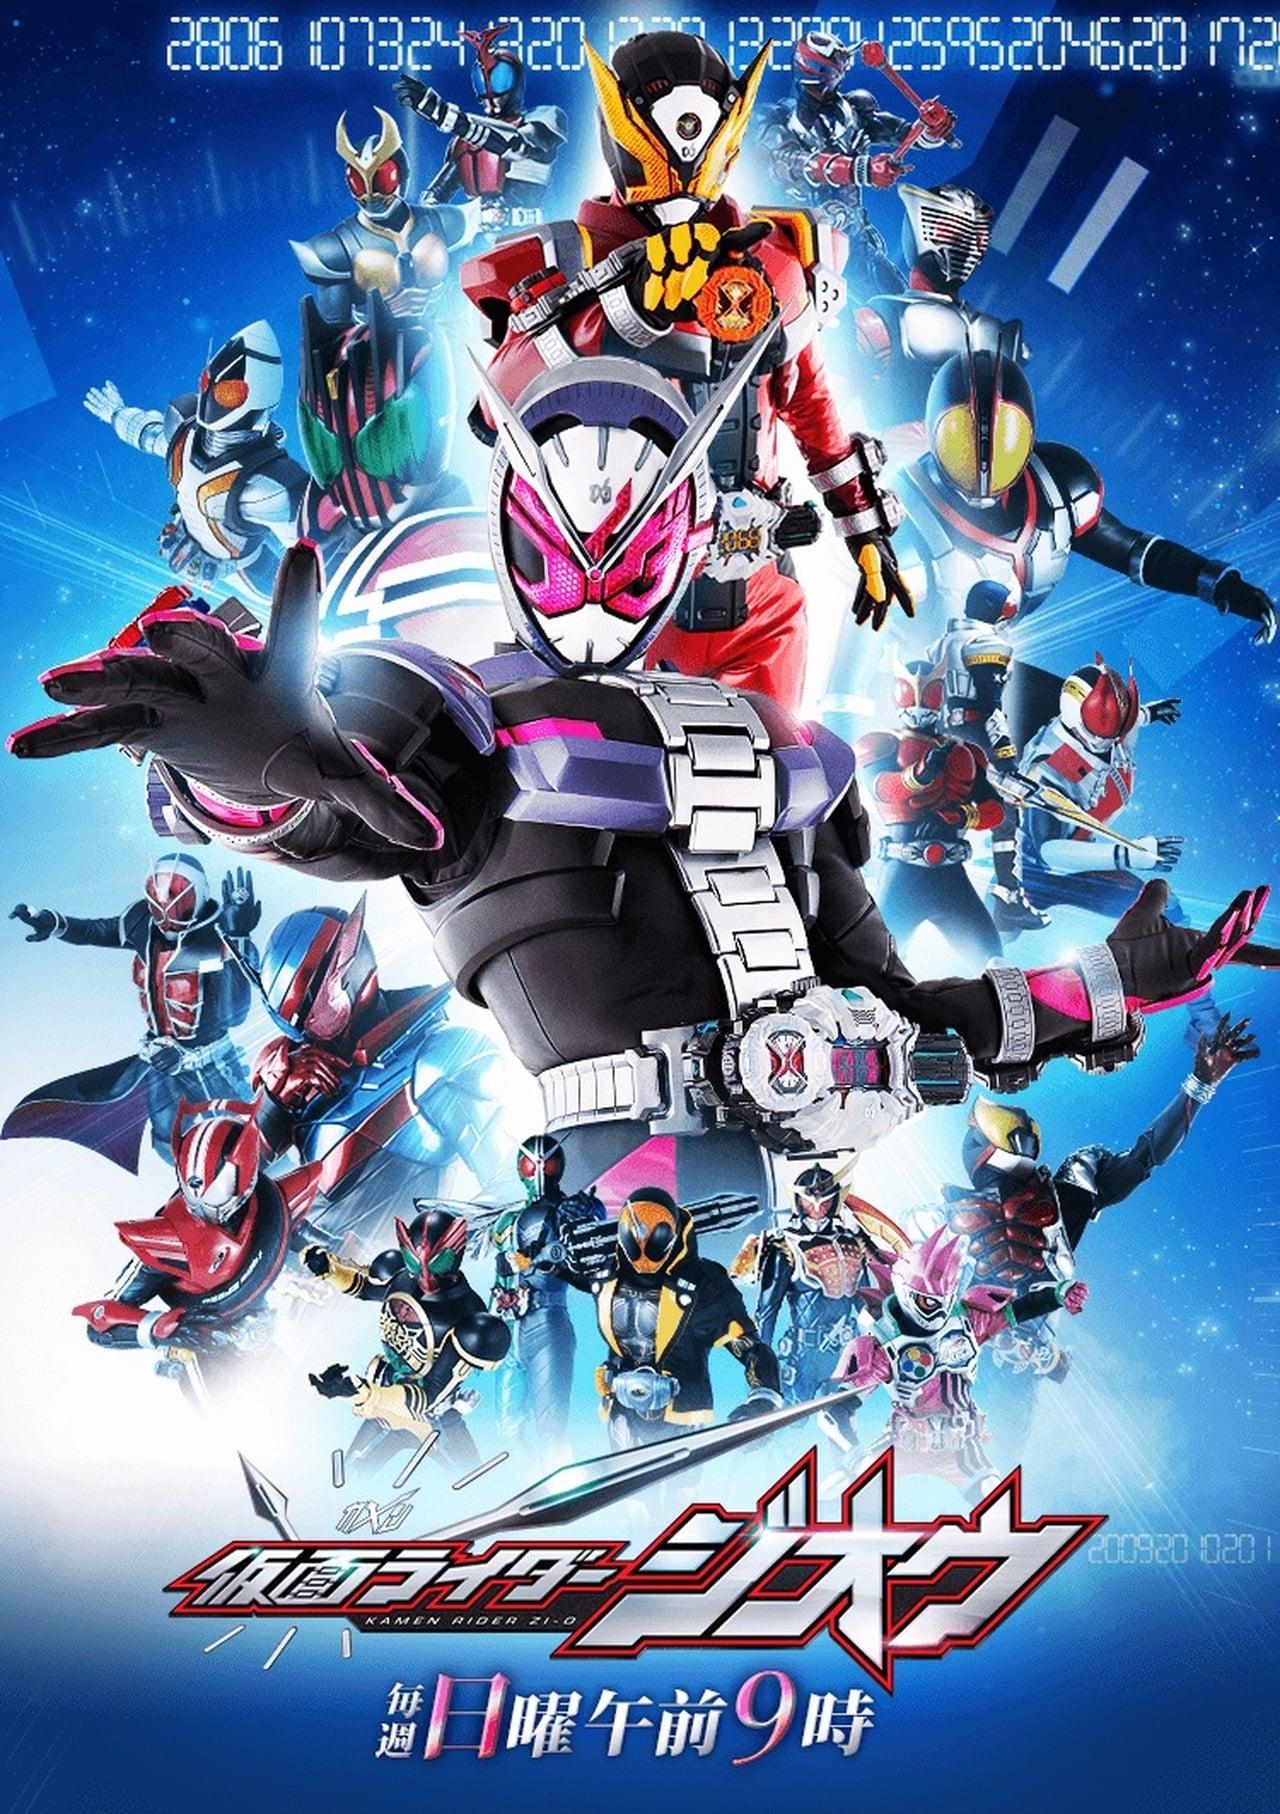 Kamen Rider Season 9 Episode 9 : Maribaron's Witchcraft